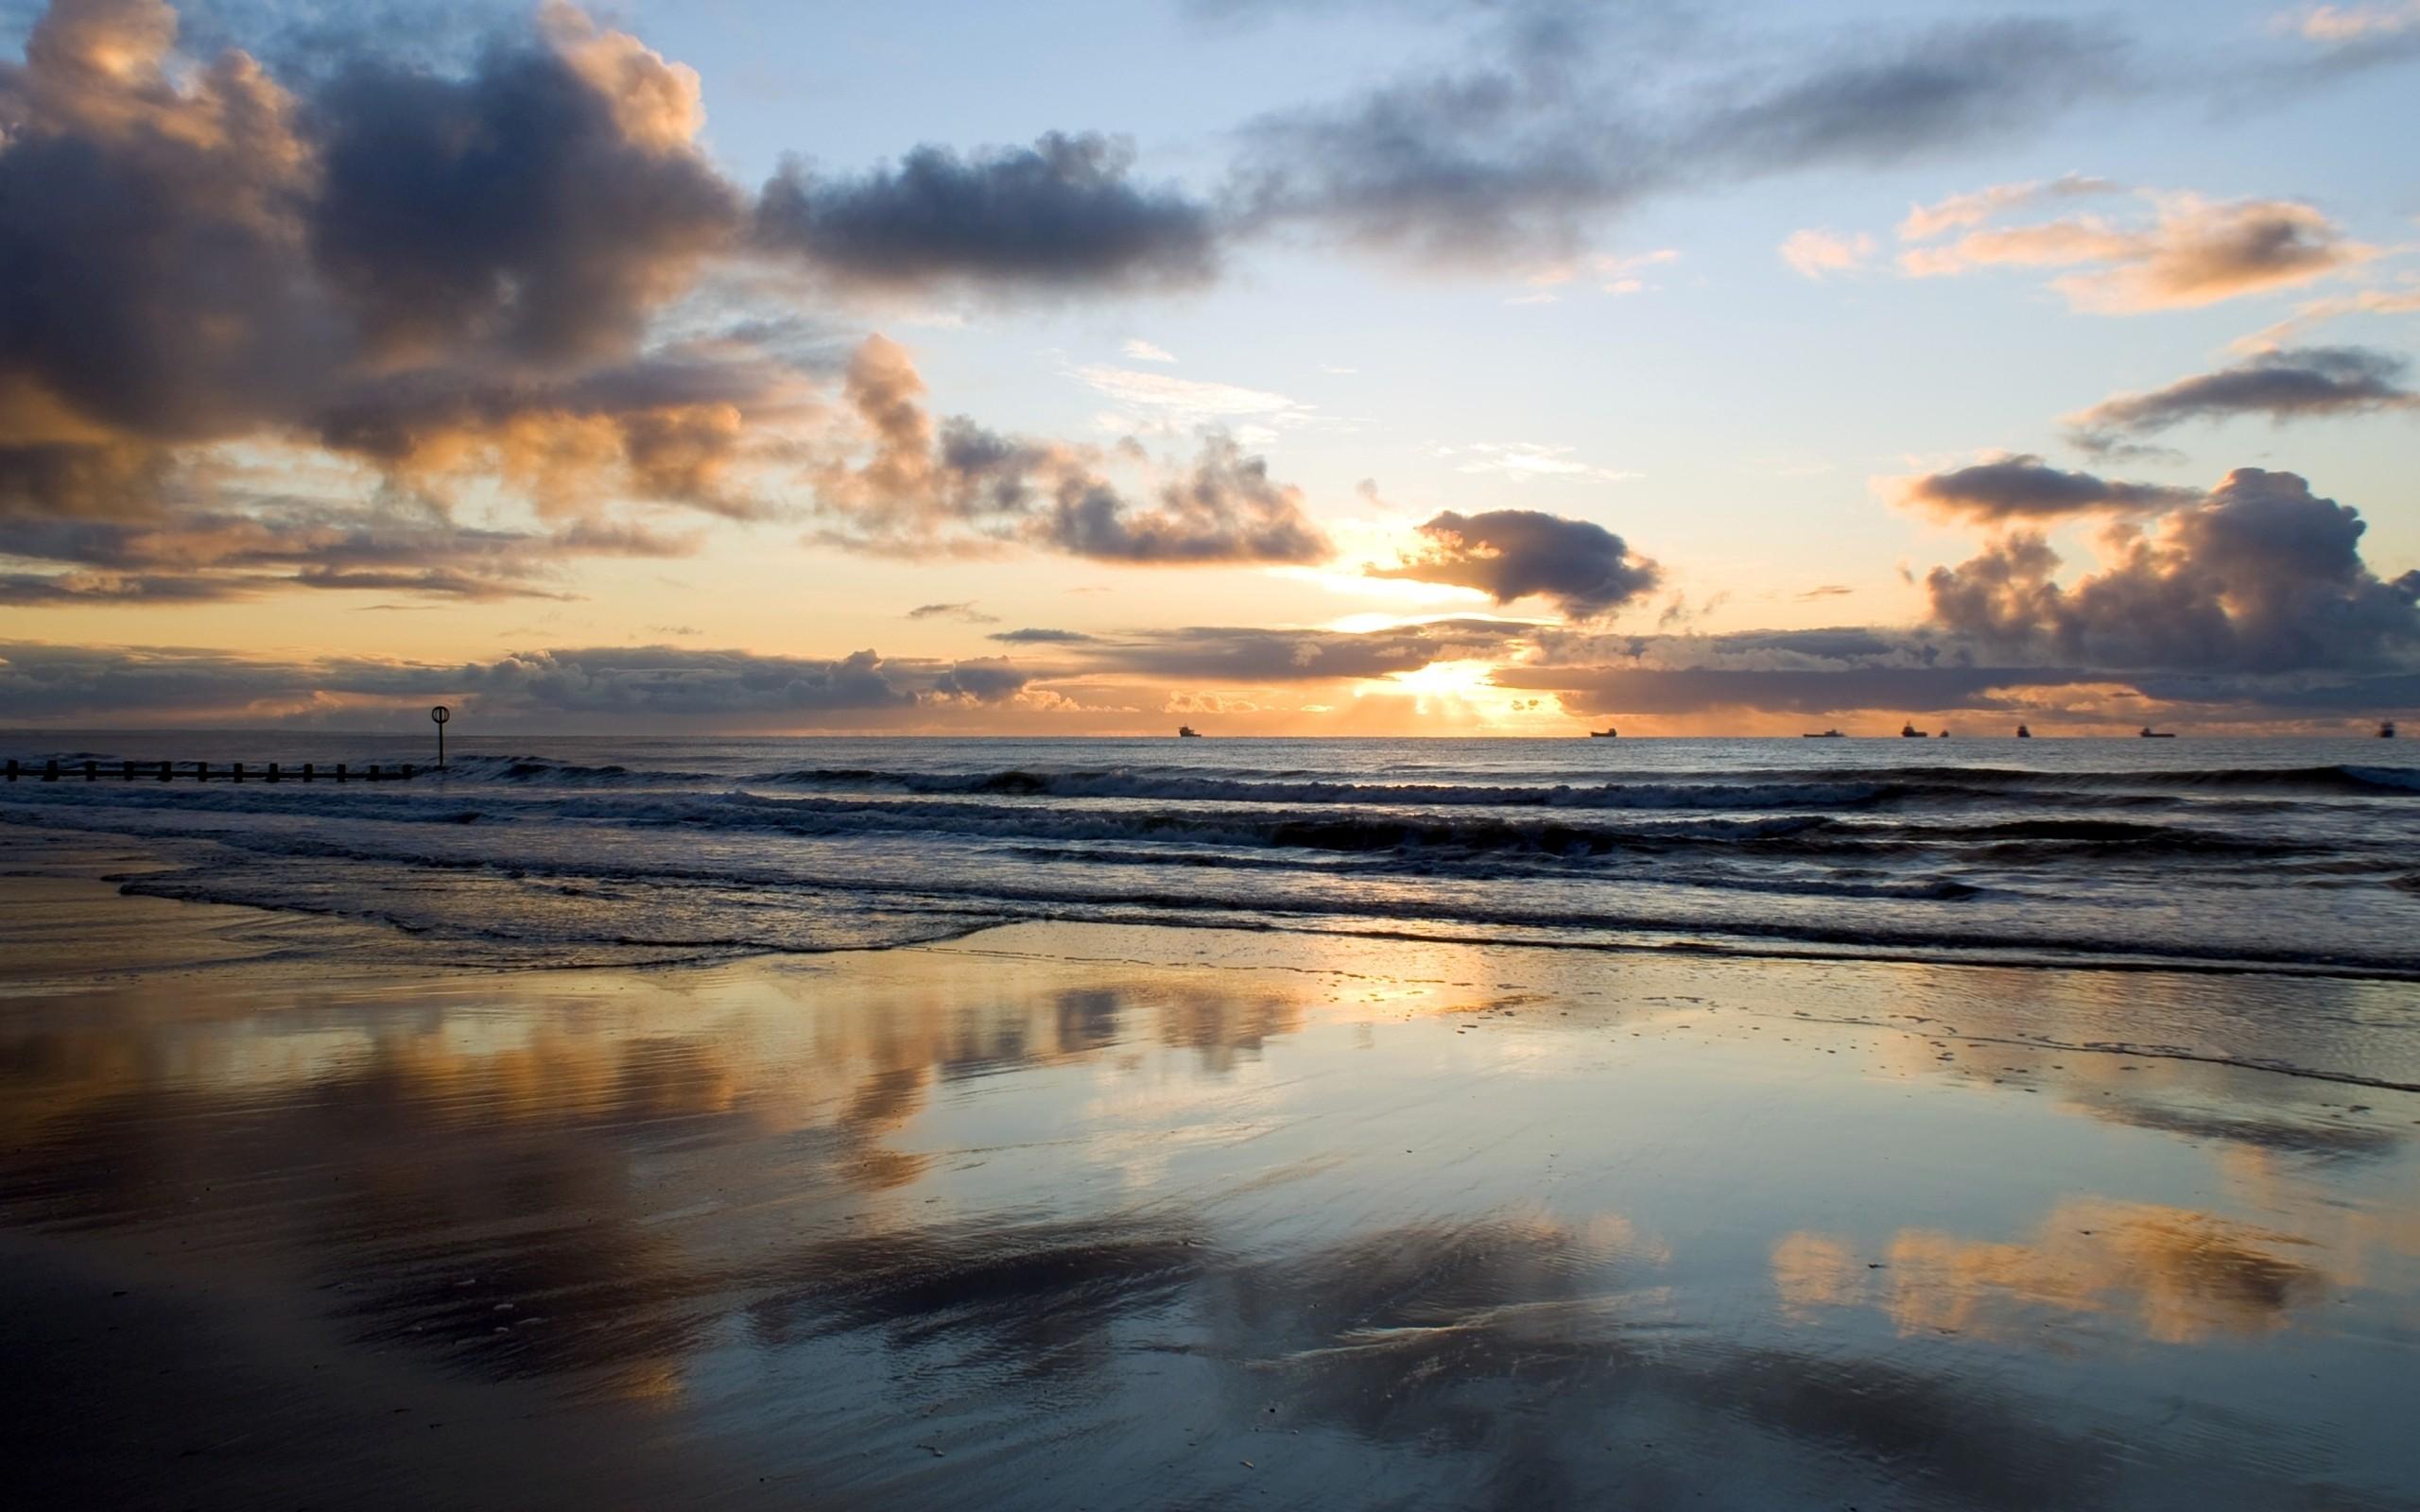 General 2560x1600 nature landscape sunset sky sea horizon beach wet seashore waves